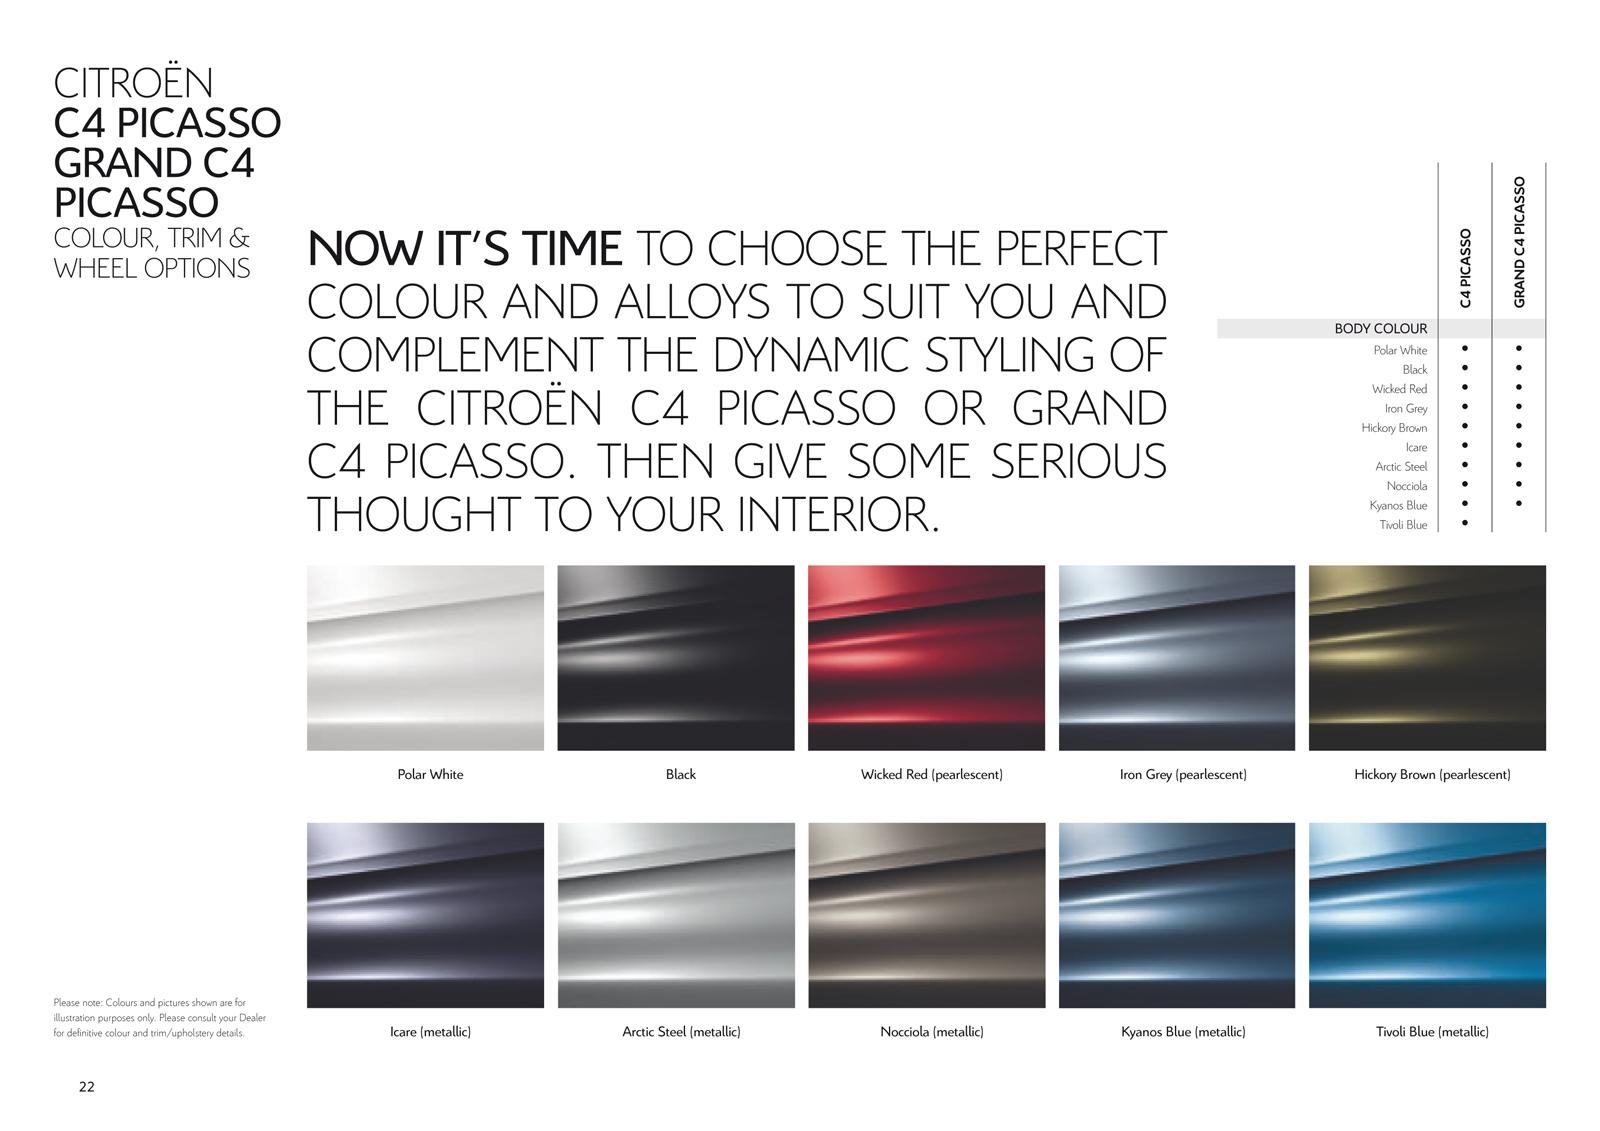 Citroen-C4-Picasso-MPV-2009-exterior-detail.jpg?itok=lqhVERlB